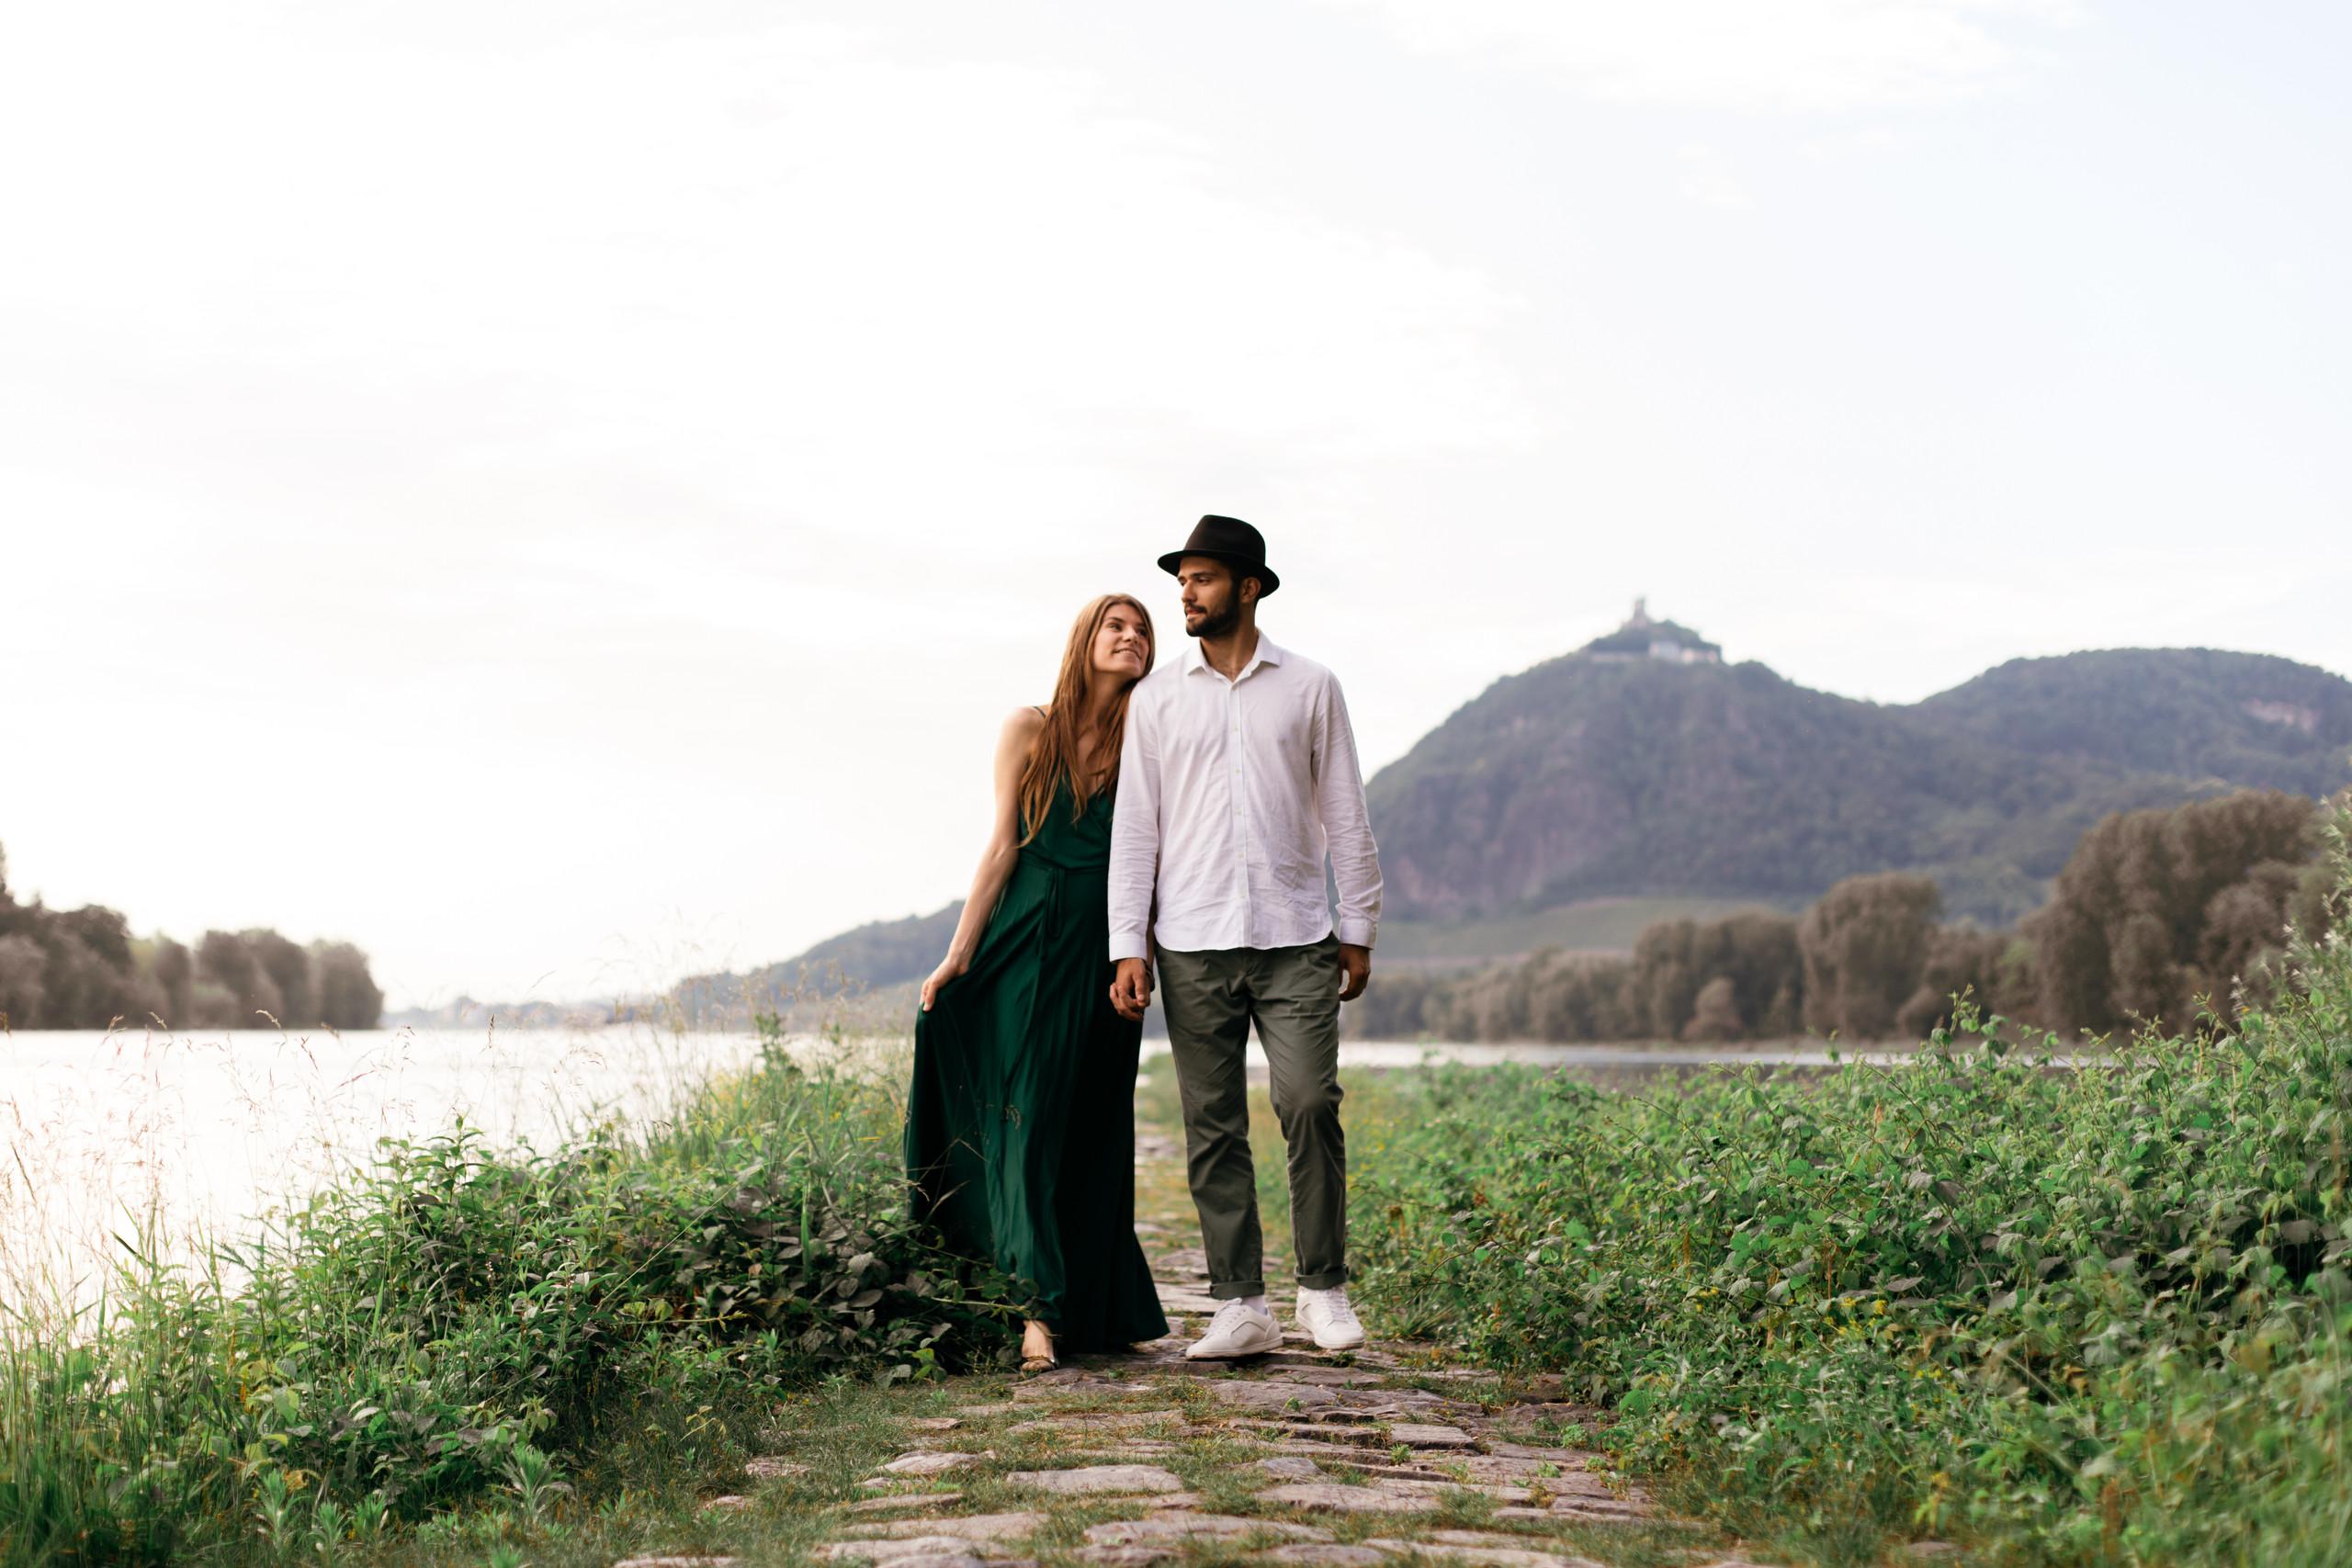 Insel-Grafenwerth-Verlobungsshooting-Hochzeitsfotograf-Bonn-09.jpg